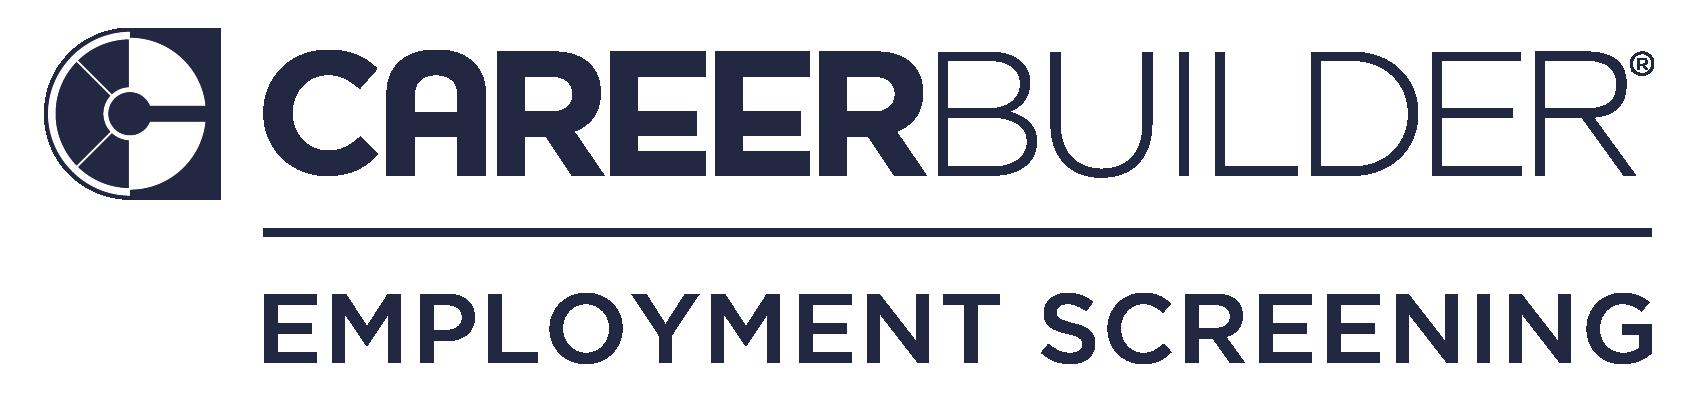 careerbuilder employment screening bullhorn marketplace